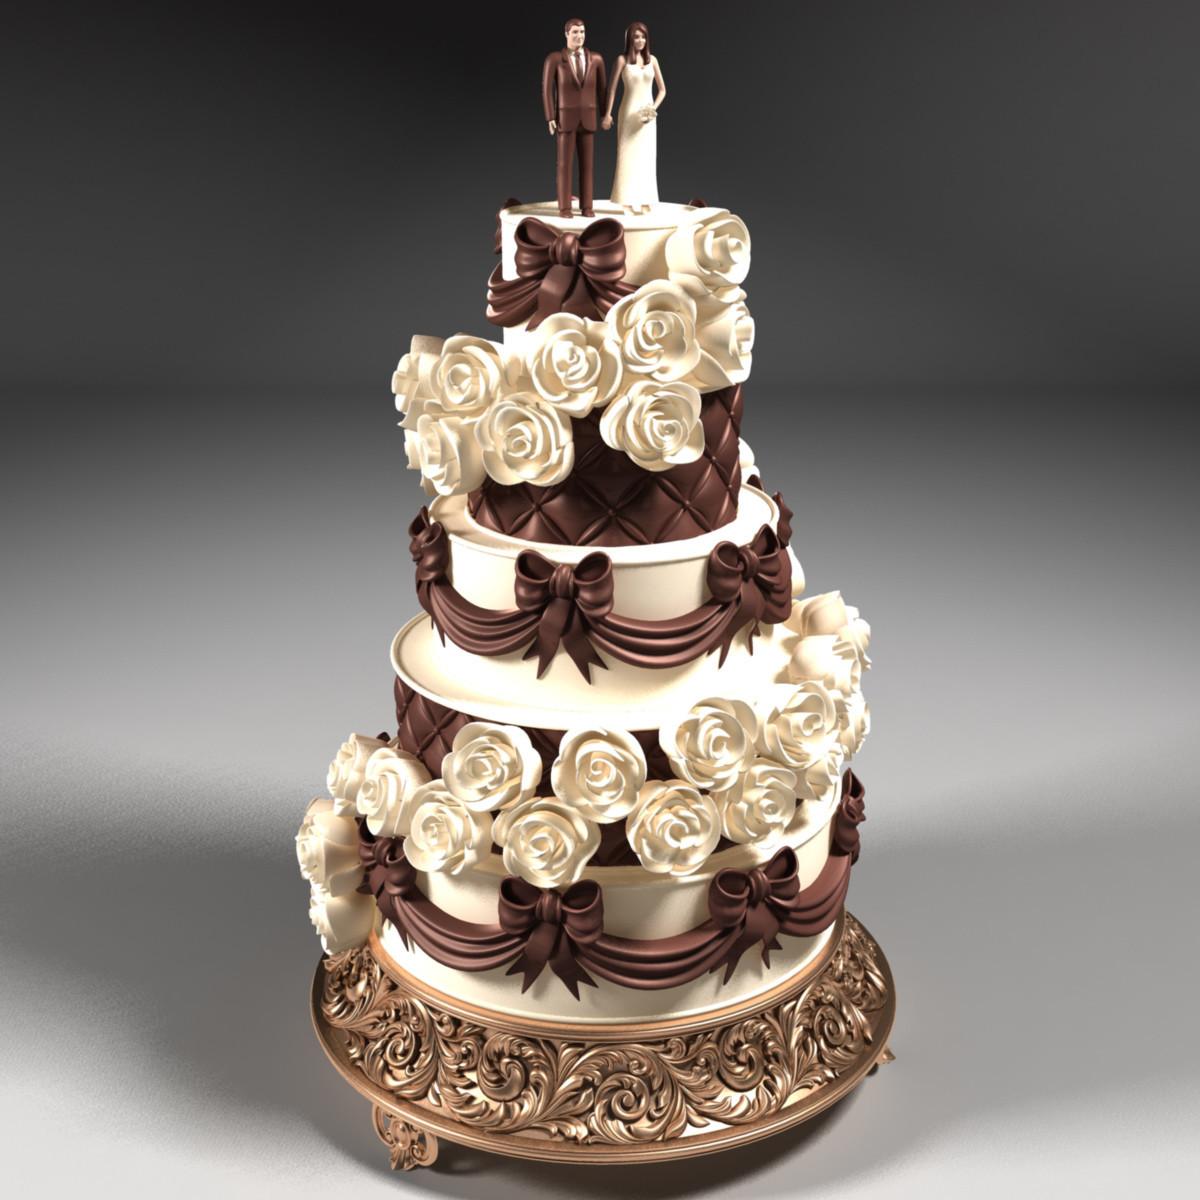 Wedding Cakes Models  Wedding Cake 3D Model 3DHunt